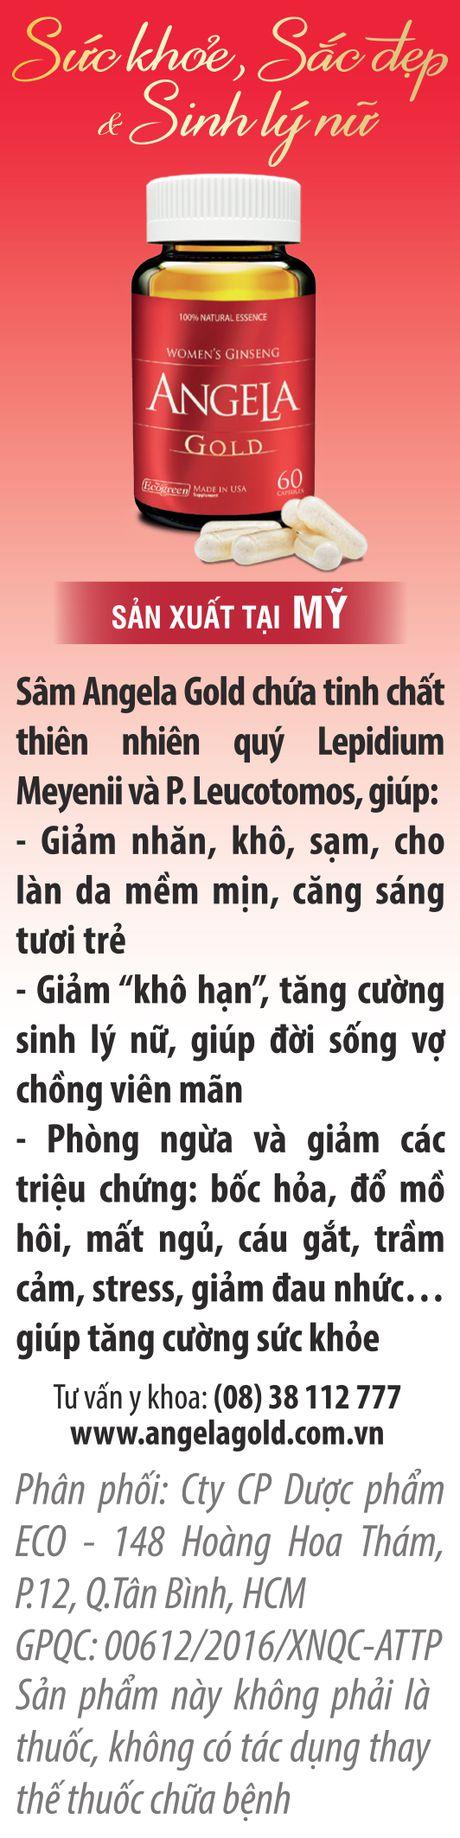 Thuong vo de giu hanh phuc cho minh - Anh 2